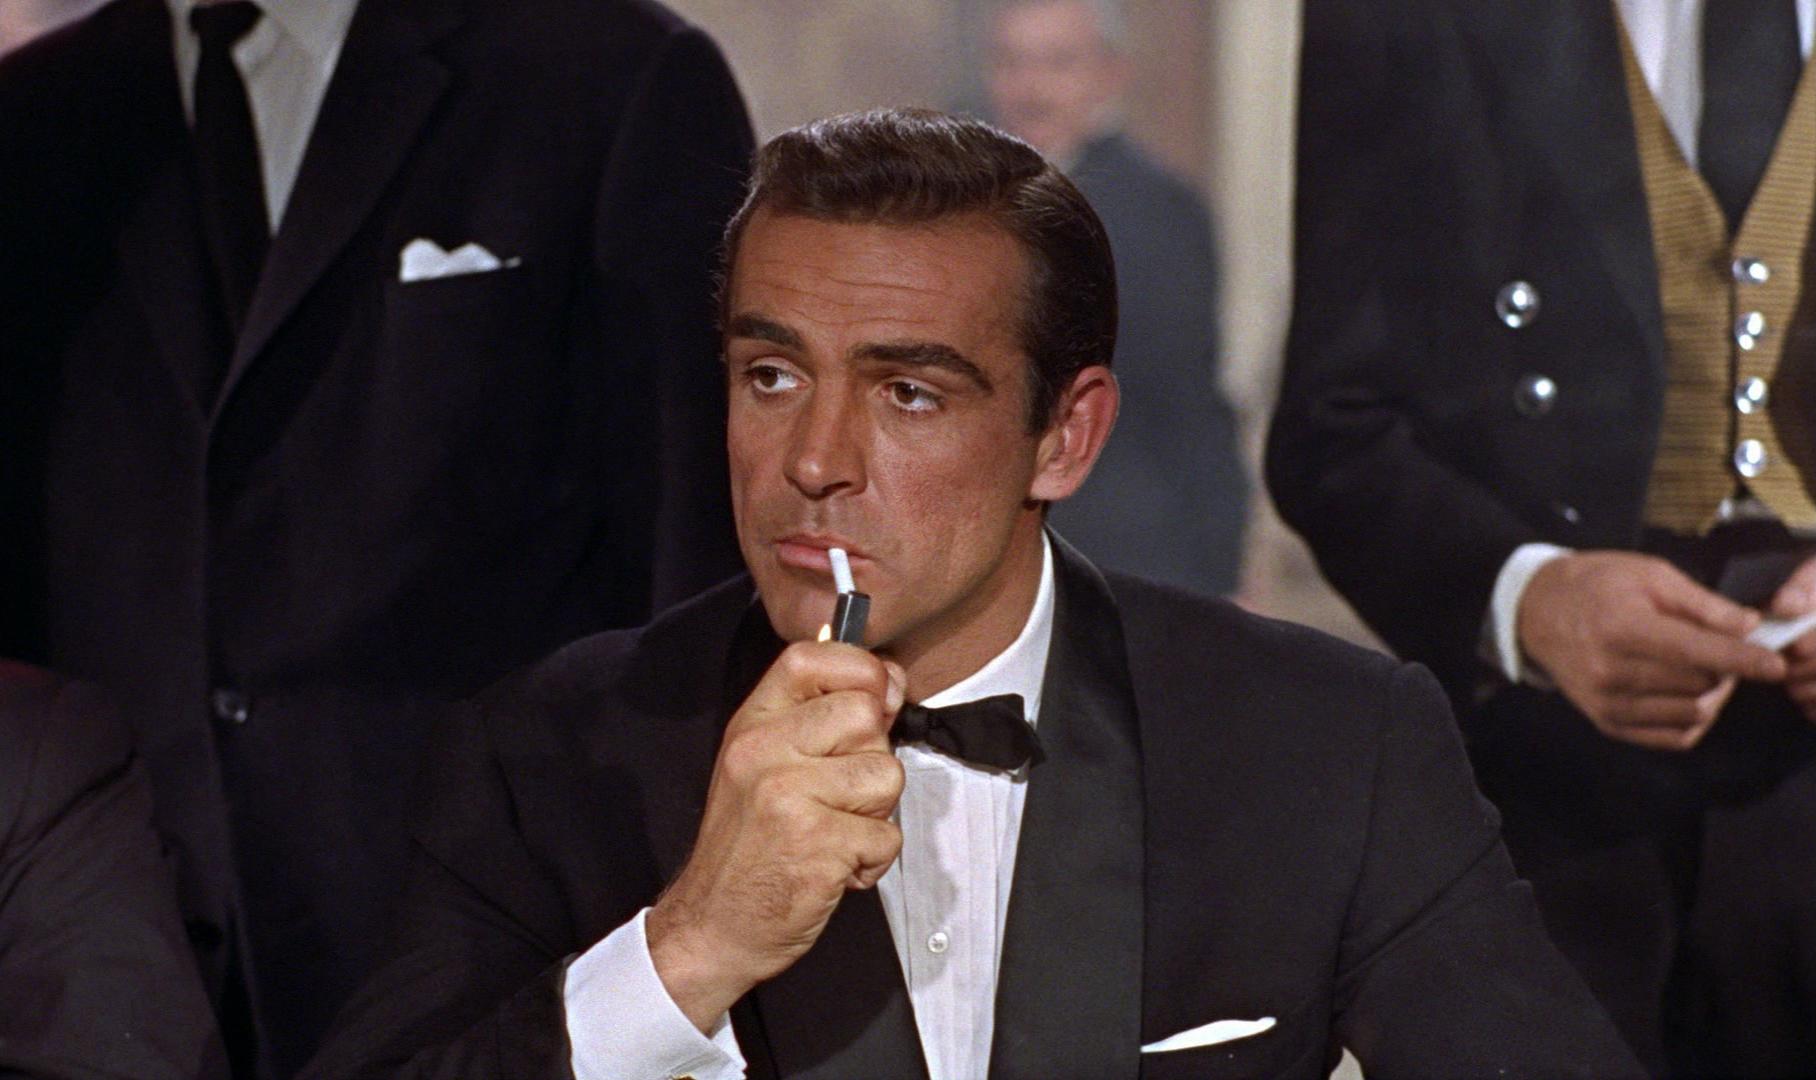 Frasi Matrimonio Tratte Da Film.James Bond Wikipedia